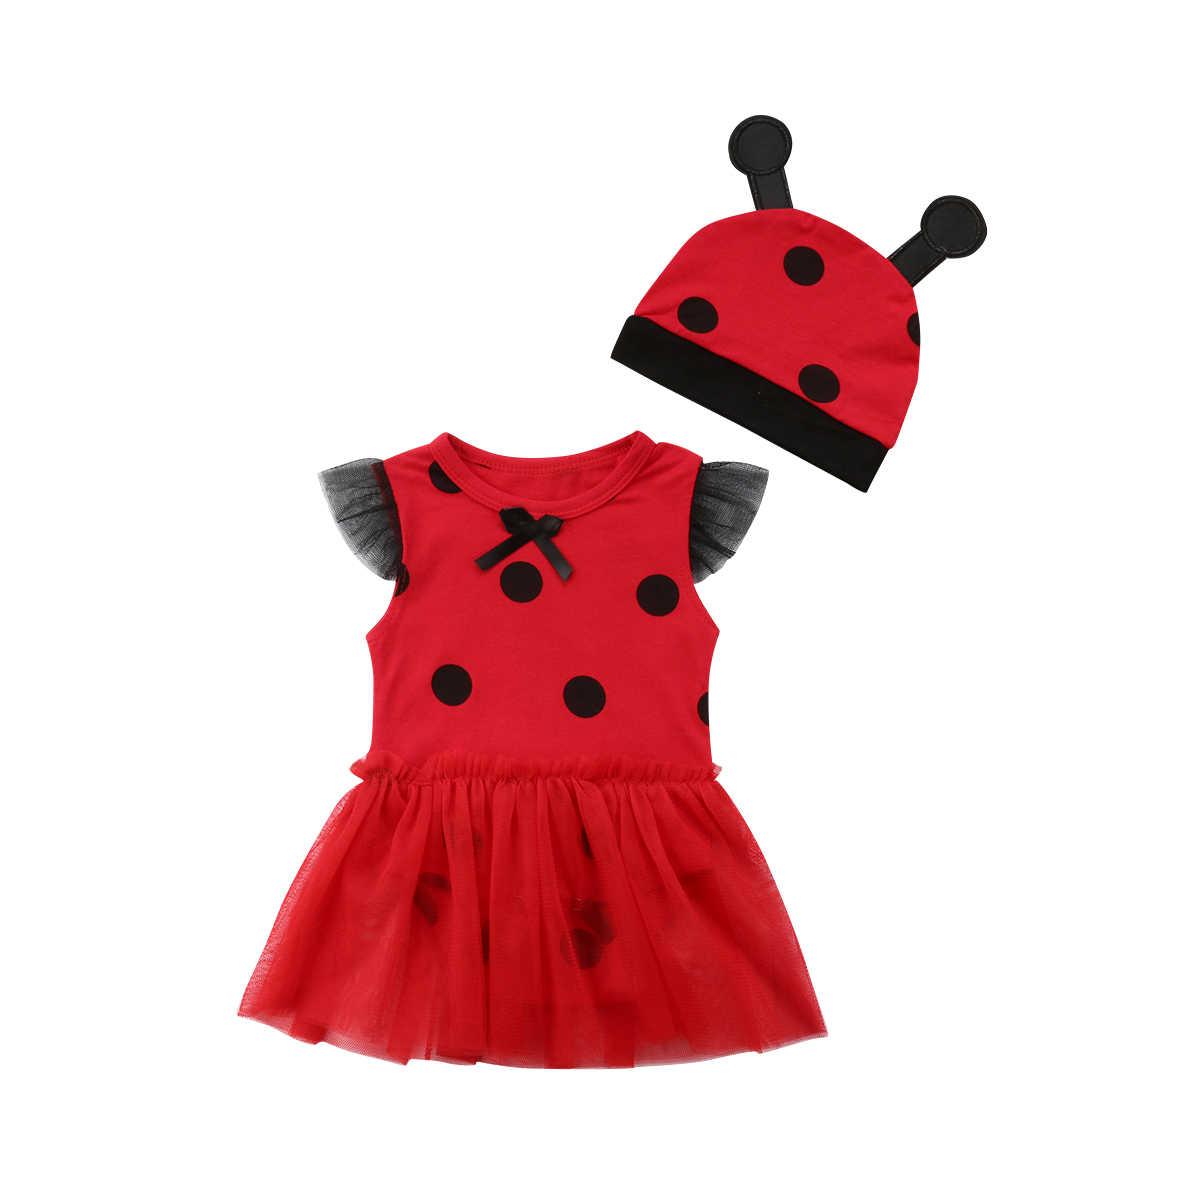 88d5038f8768 Detail Feedback Questions about Newborn Baby Girls ladybird Romper ...